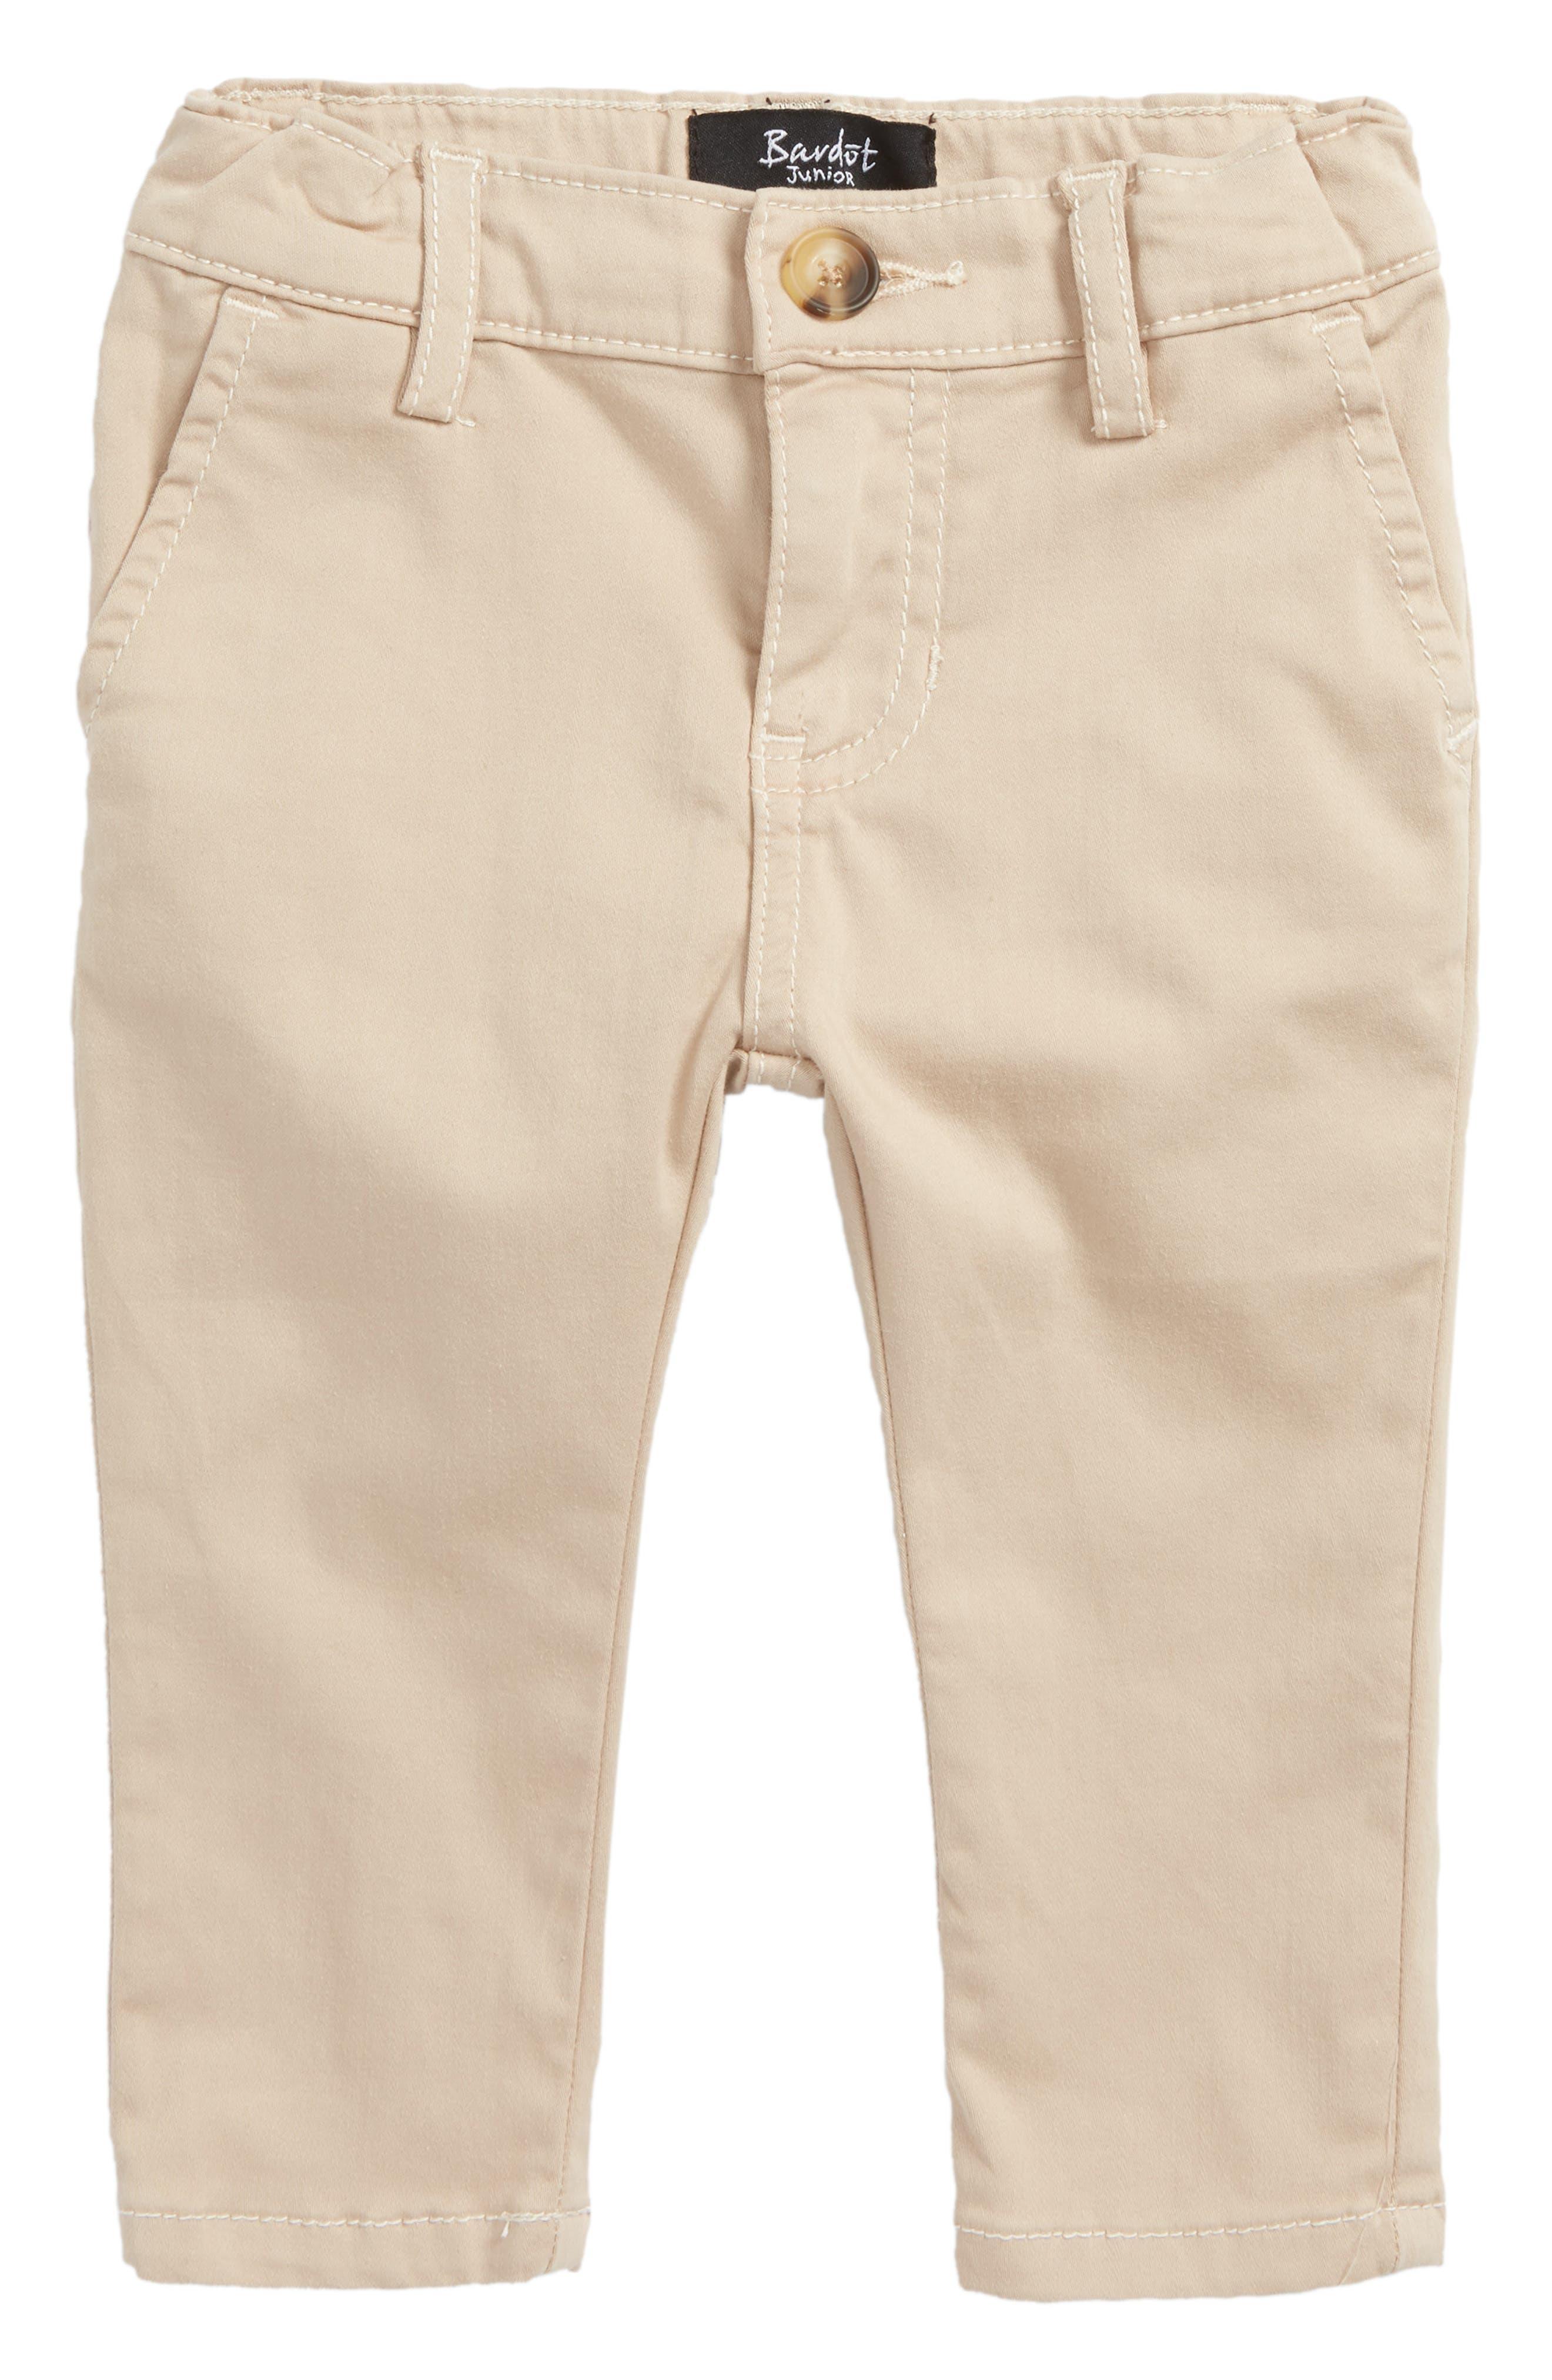 Alternate Image 1 Selected - Bardot Junior Jack Chino Pants (Baby Boys & Toddler Boys)